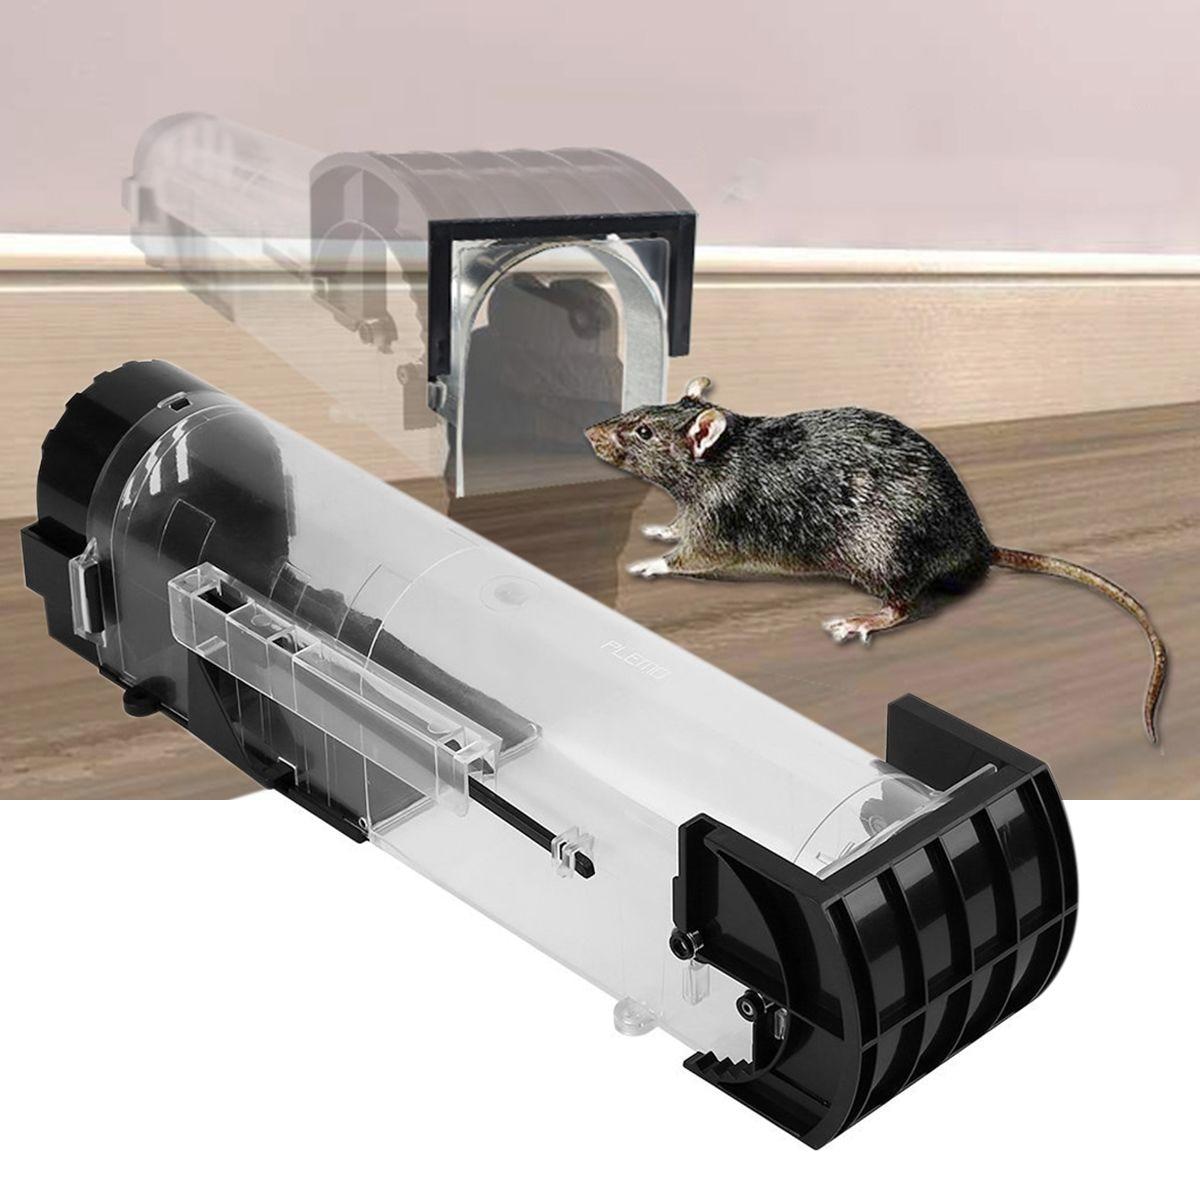 Plastic Mousetrap Catching Cage Mouse Trap Rat Mice Control Extri Jam Tangan Pria X3001a Hitam Kontrol Hewan Pengerat Tikus Kandang Menangkap Umpan Beracun Manusiawi Hidup Perangkap Hamster